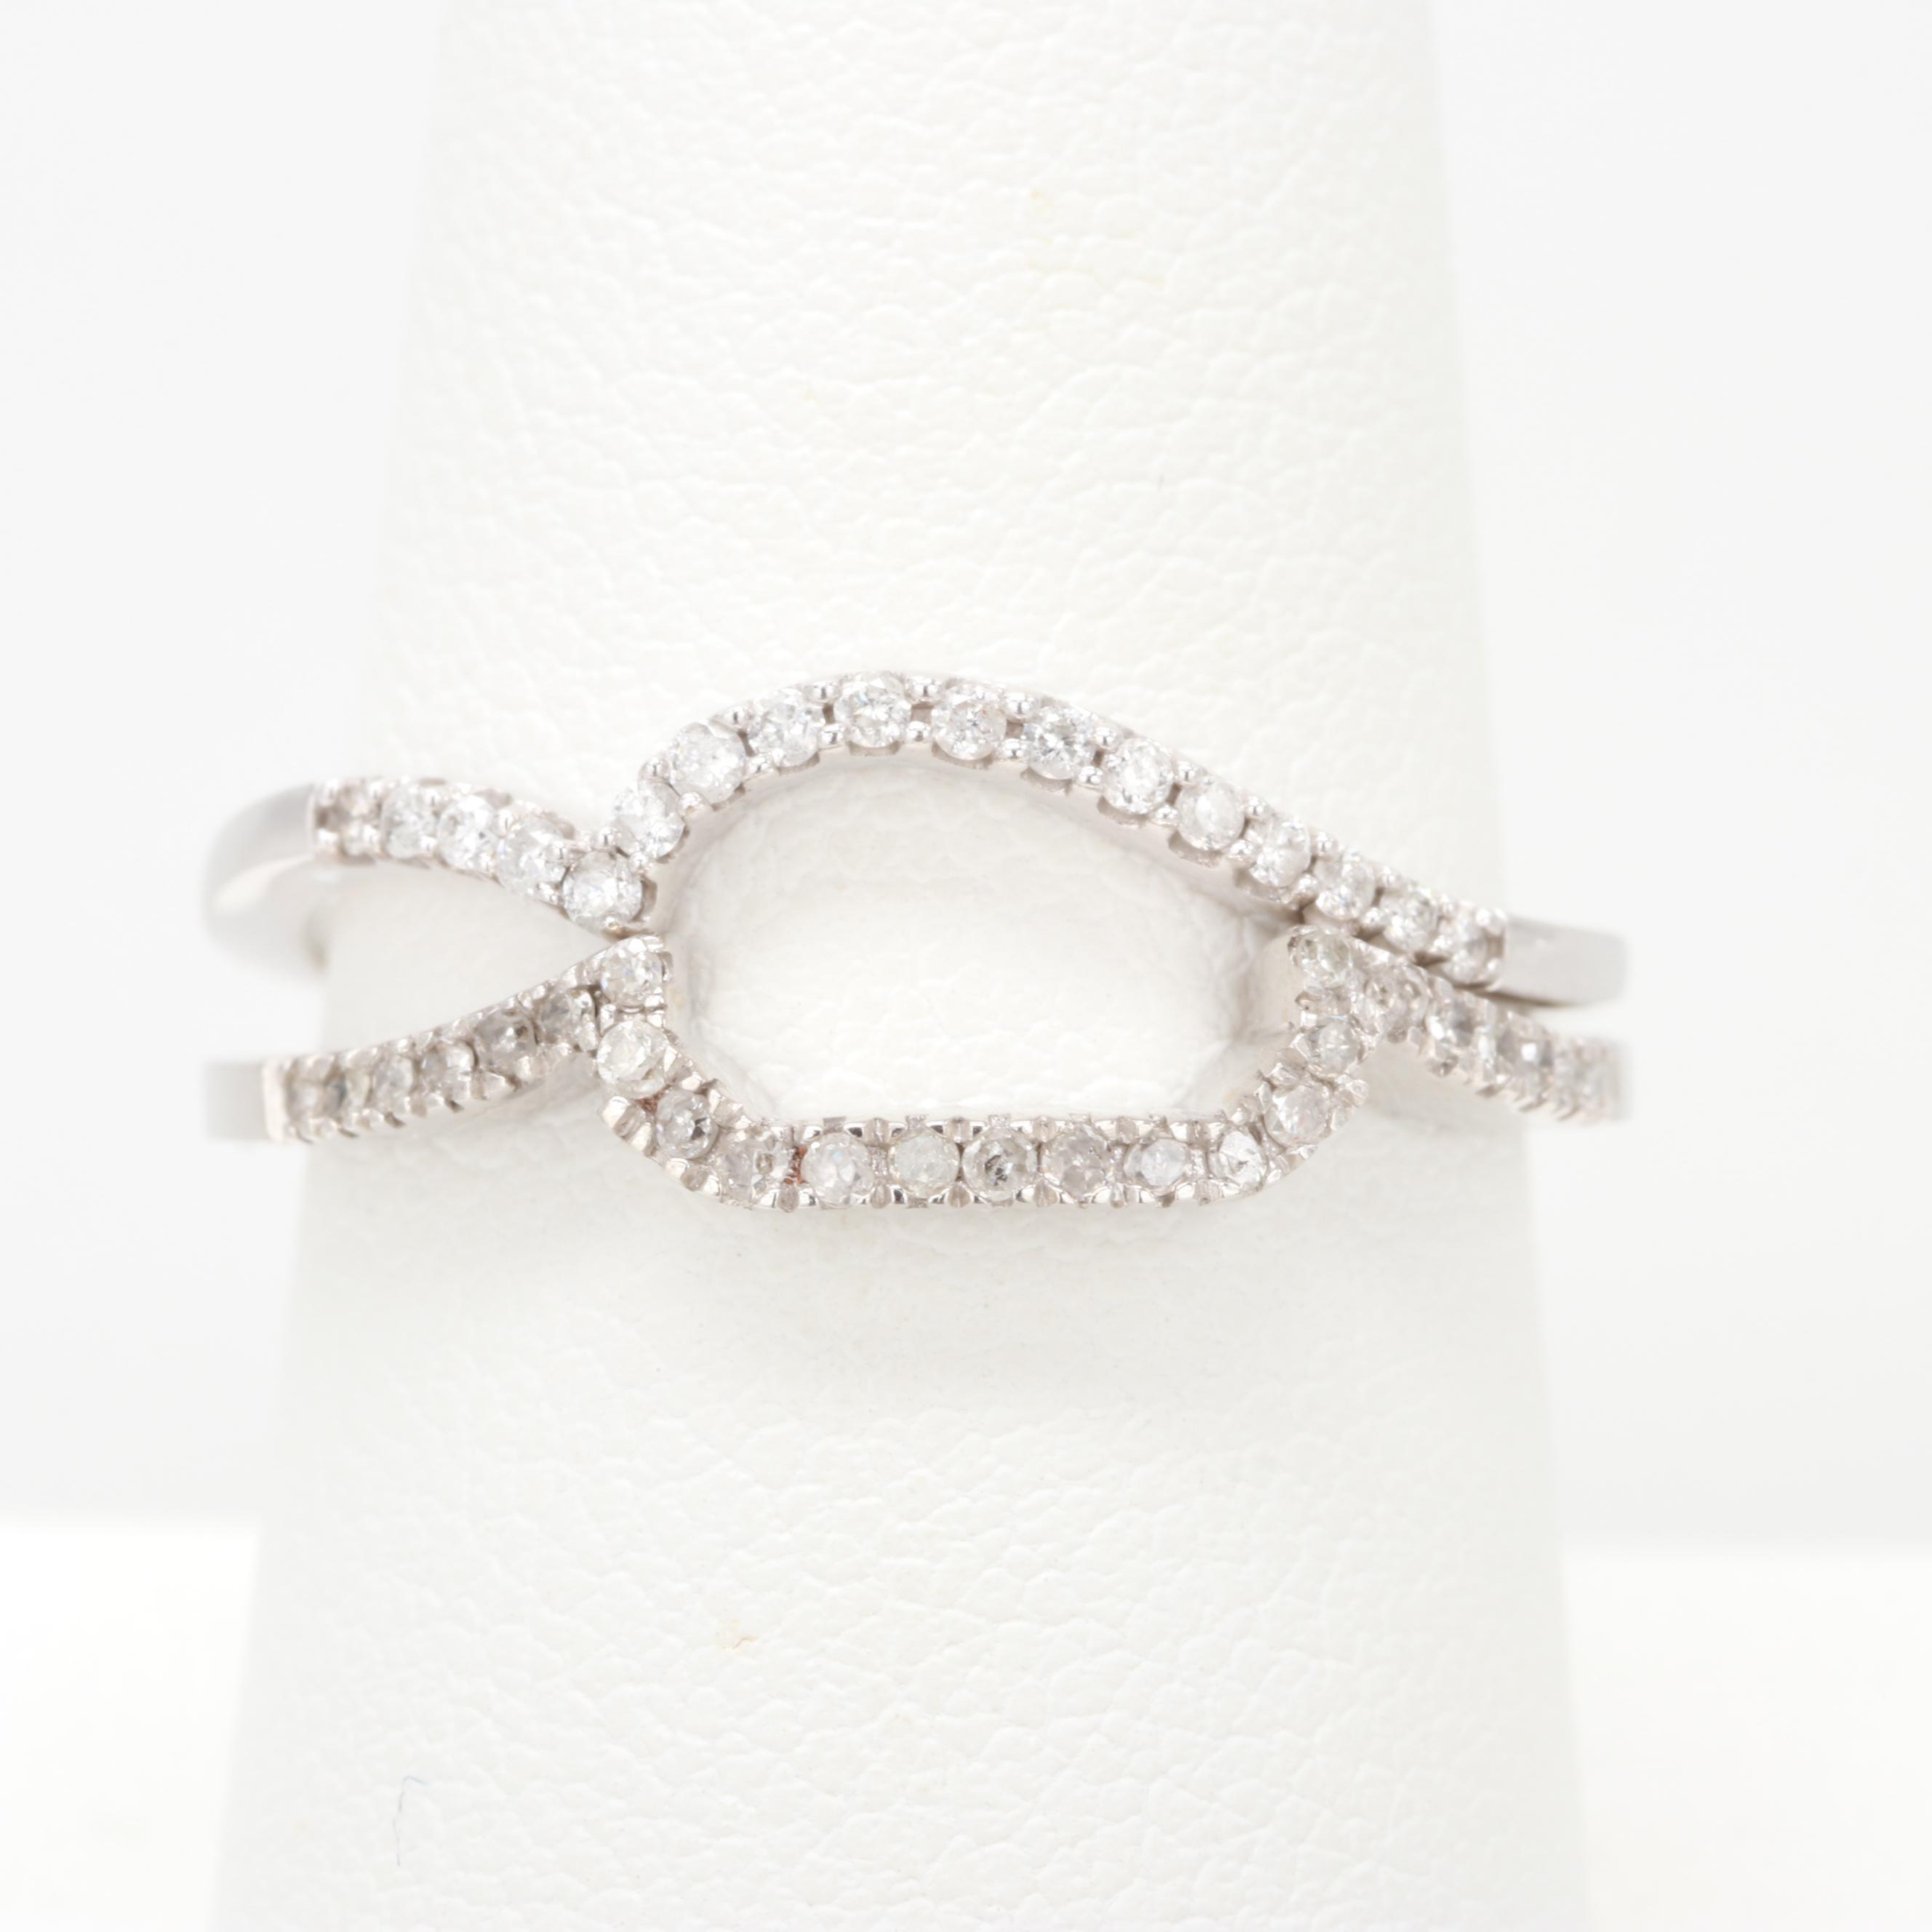 10K White Gold Diamond Shadow Bands